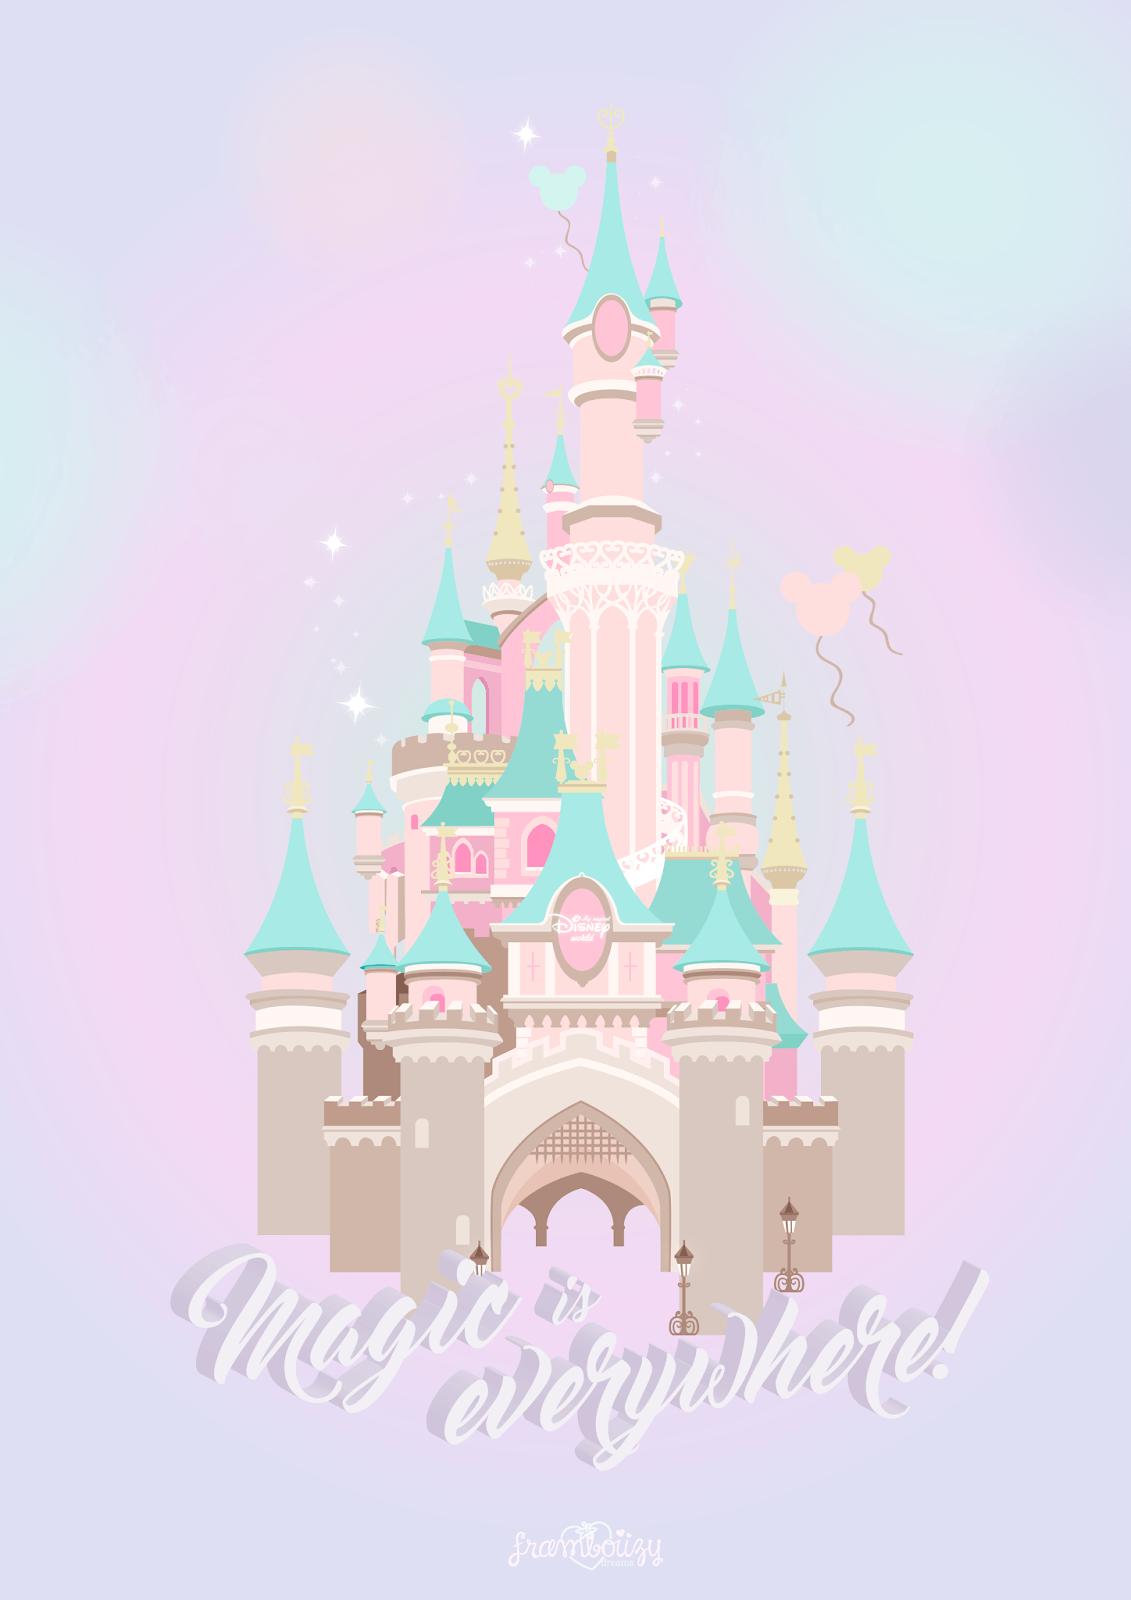 Pastel Disney Wallpapers - Top Free Pastel Disney Backgrounds - WallpaperAccess